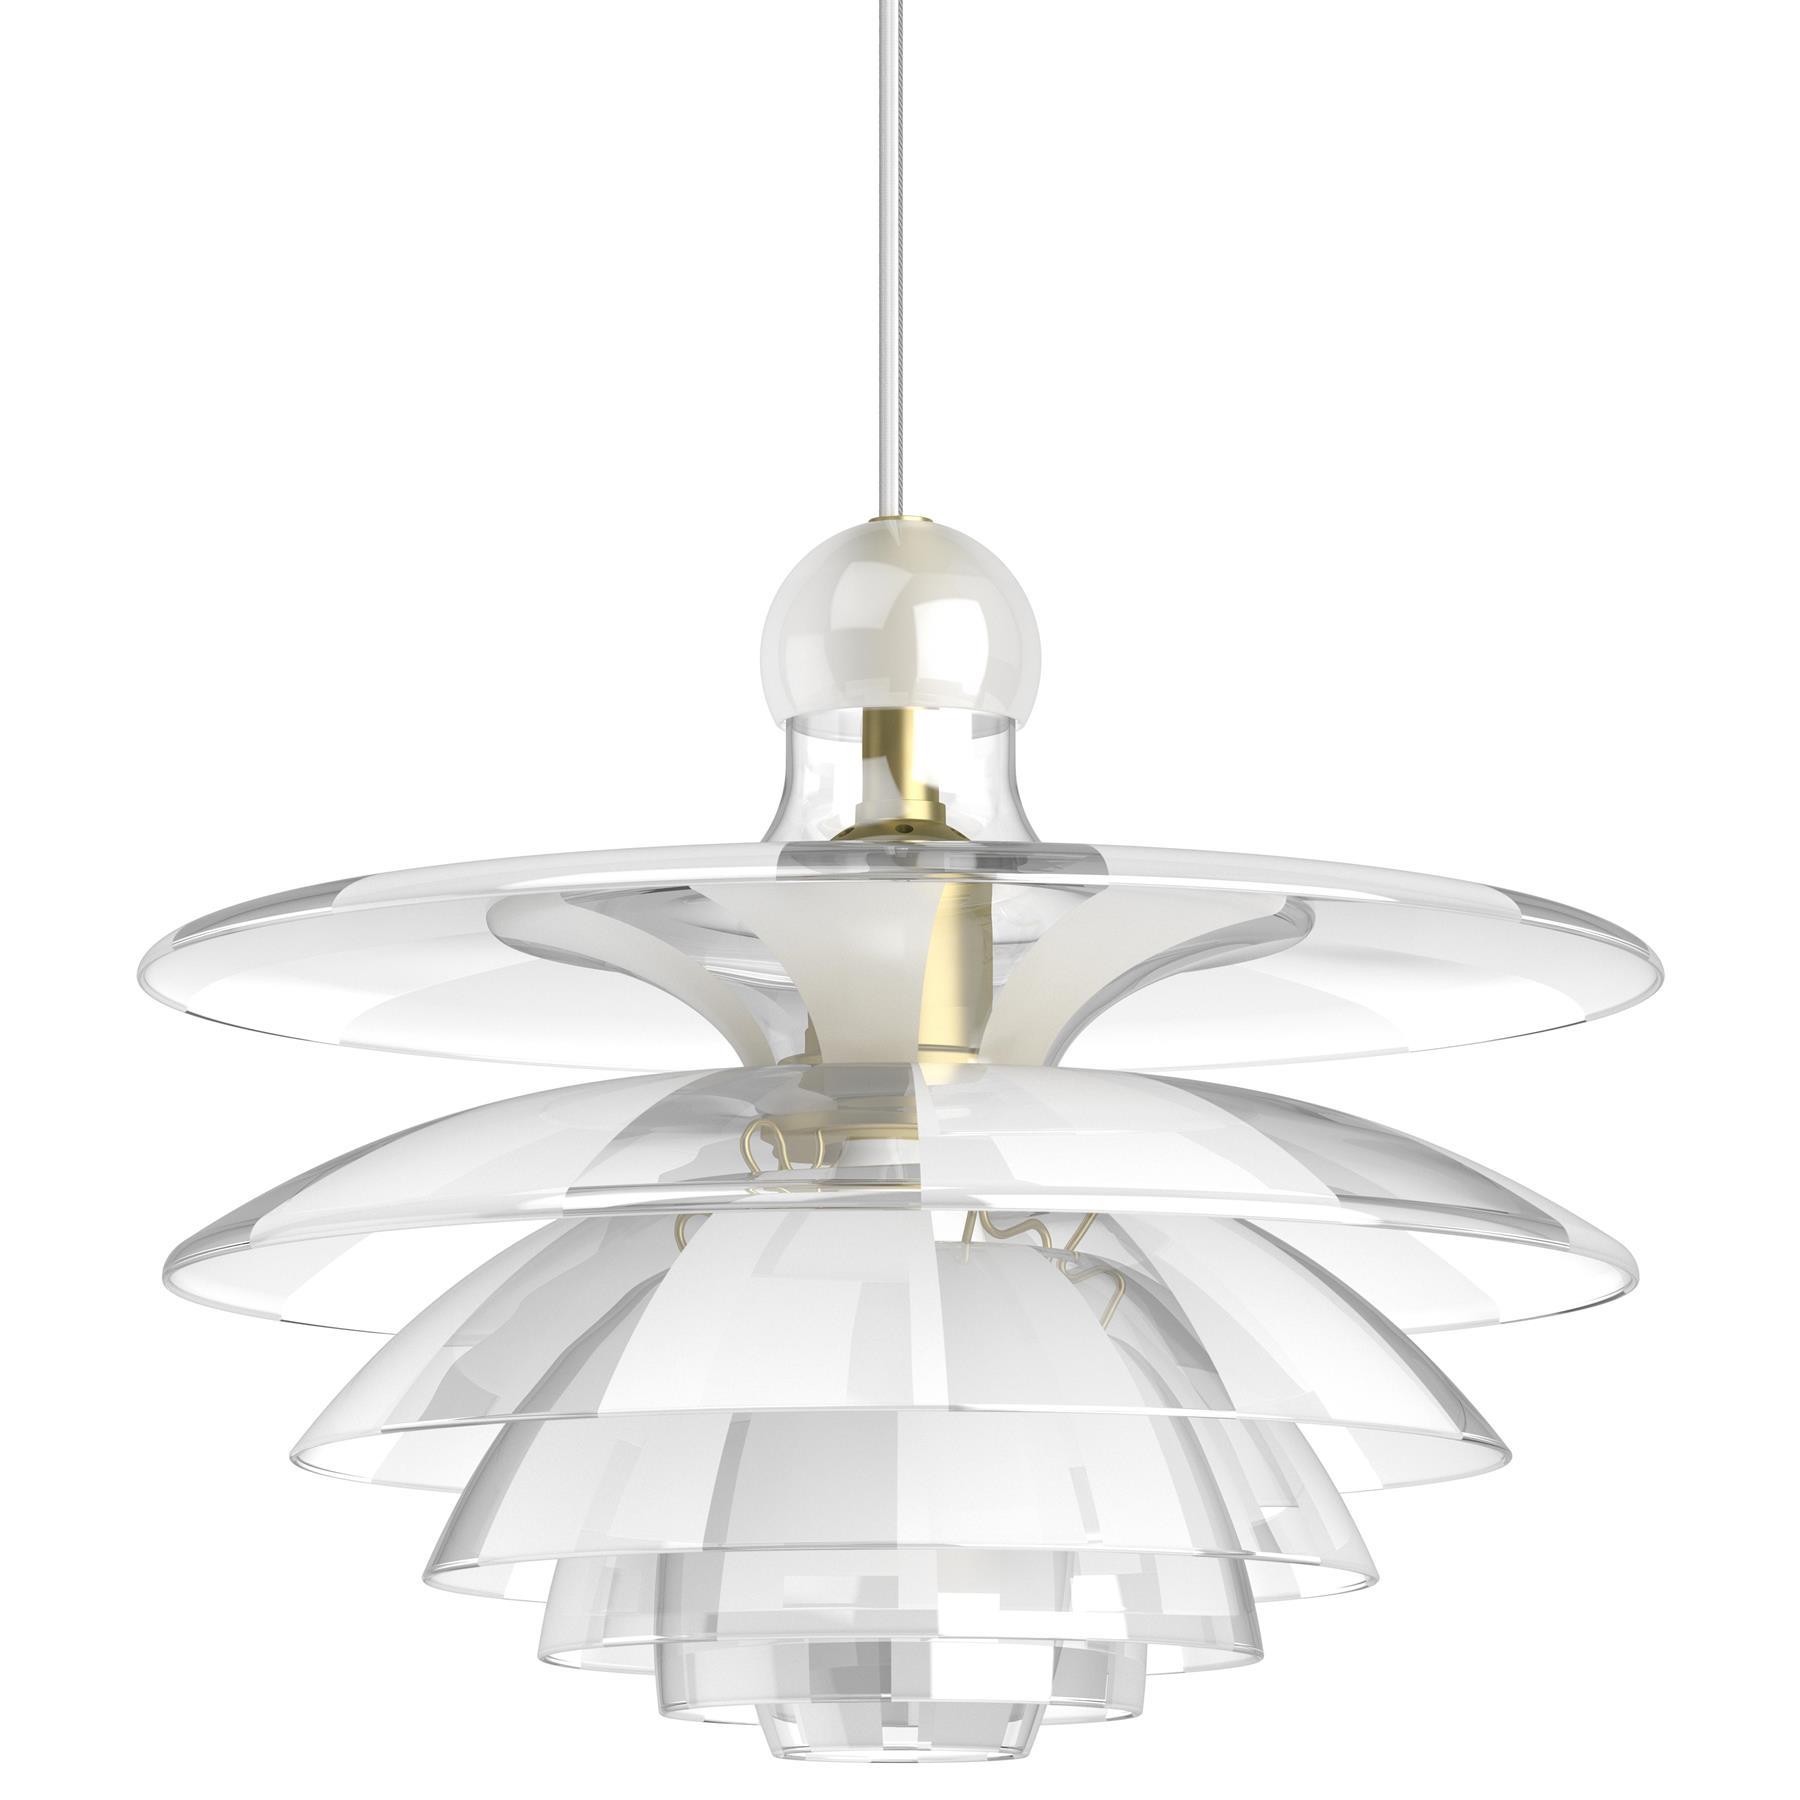 FonQ-Louis Poulsen PH Septima hanglamp-aanbieding